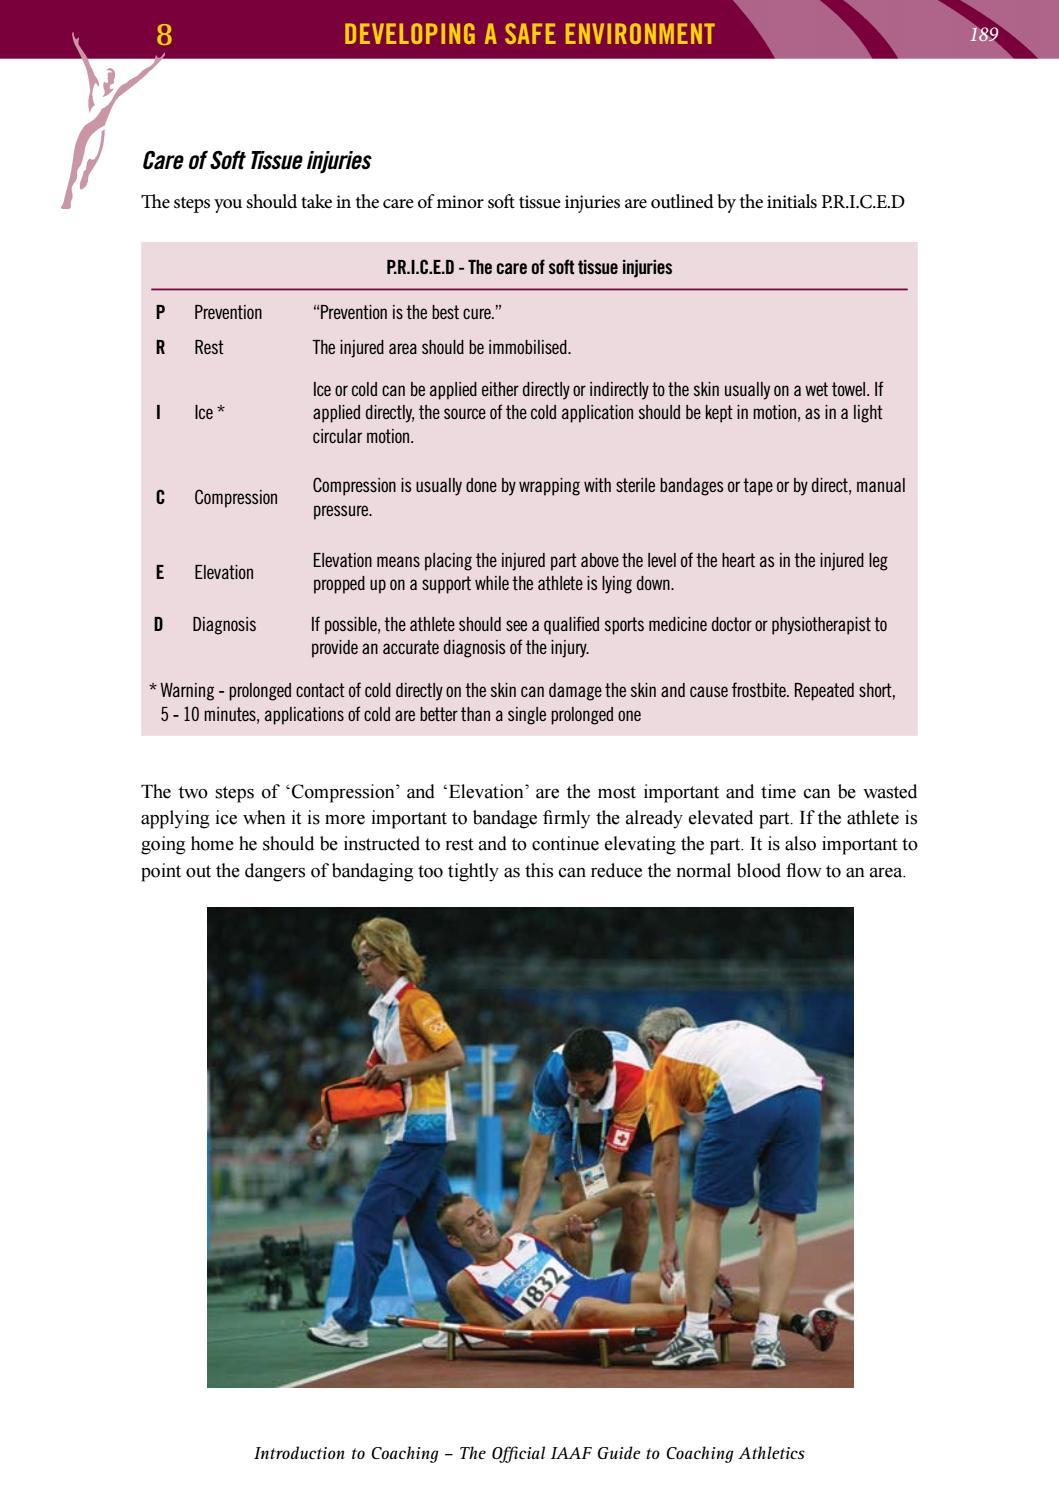 IAAF Introduction to coaching by Athletics Fiji - Issuu